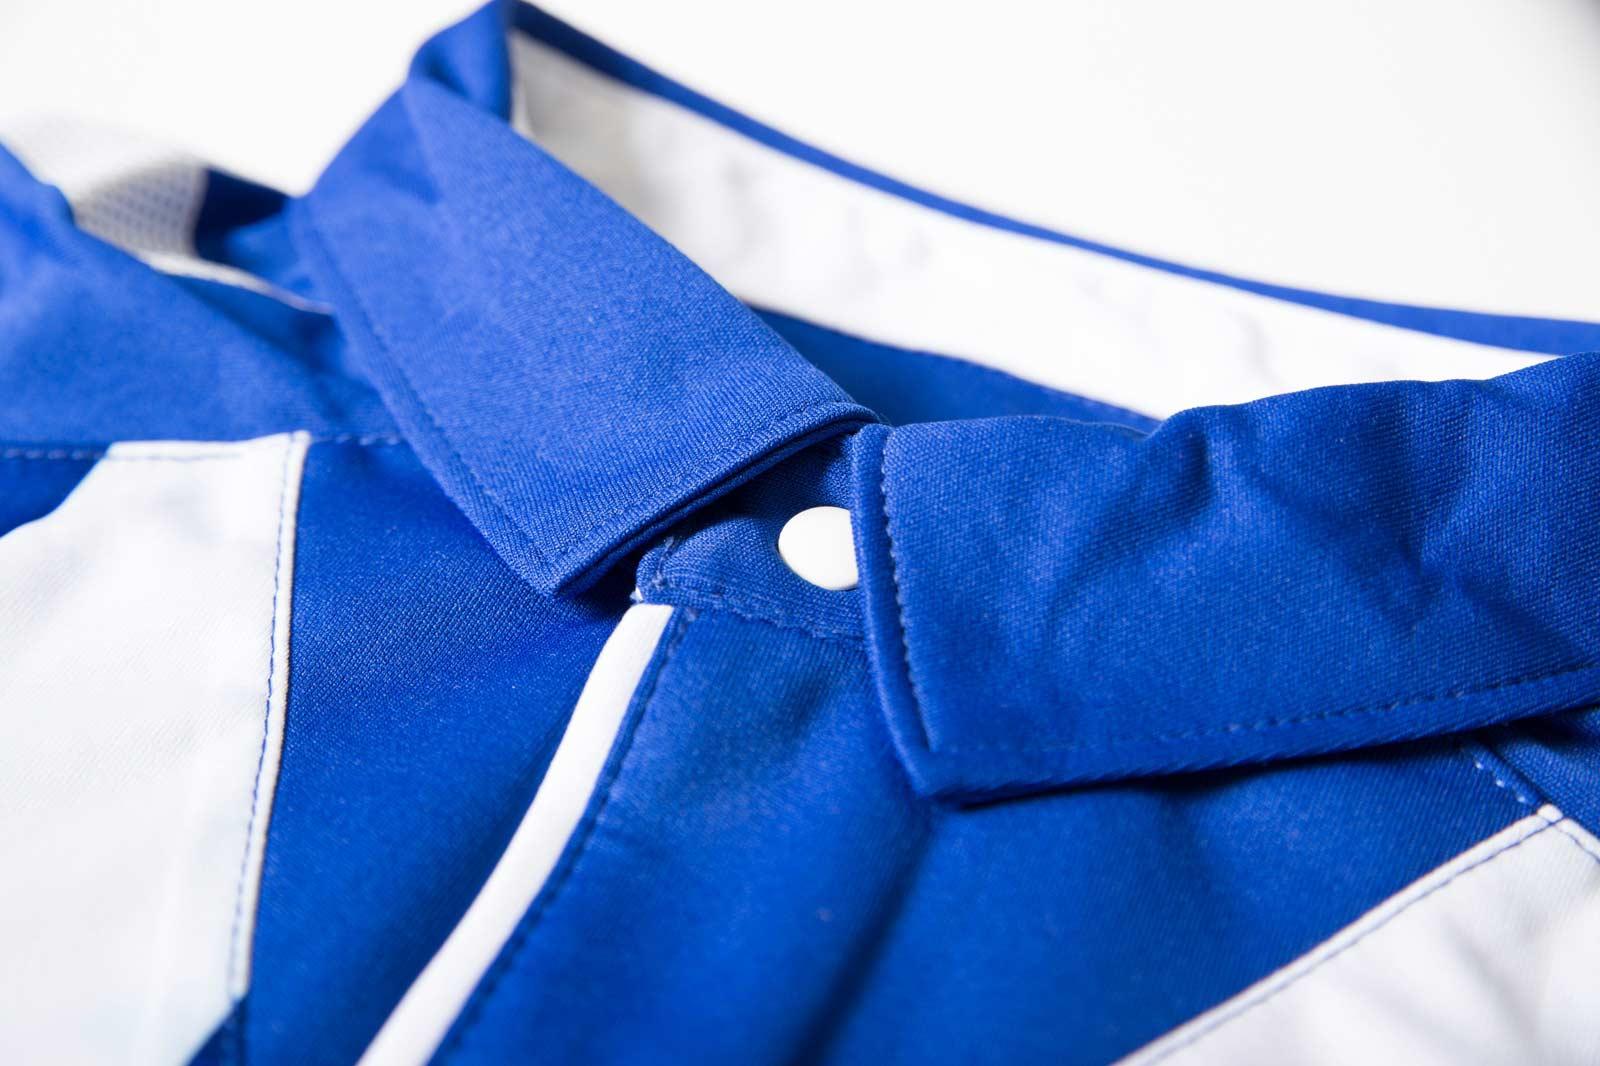 alaves-16-17-la-liga-home-kit-collar